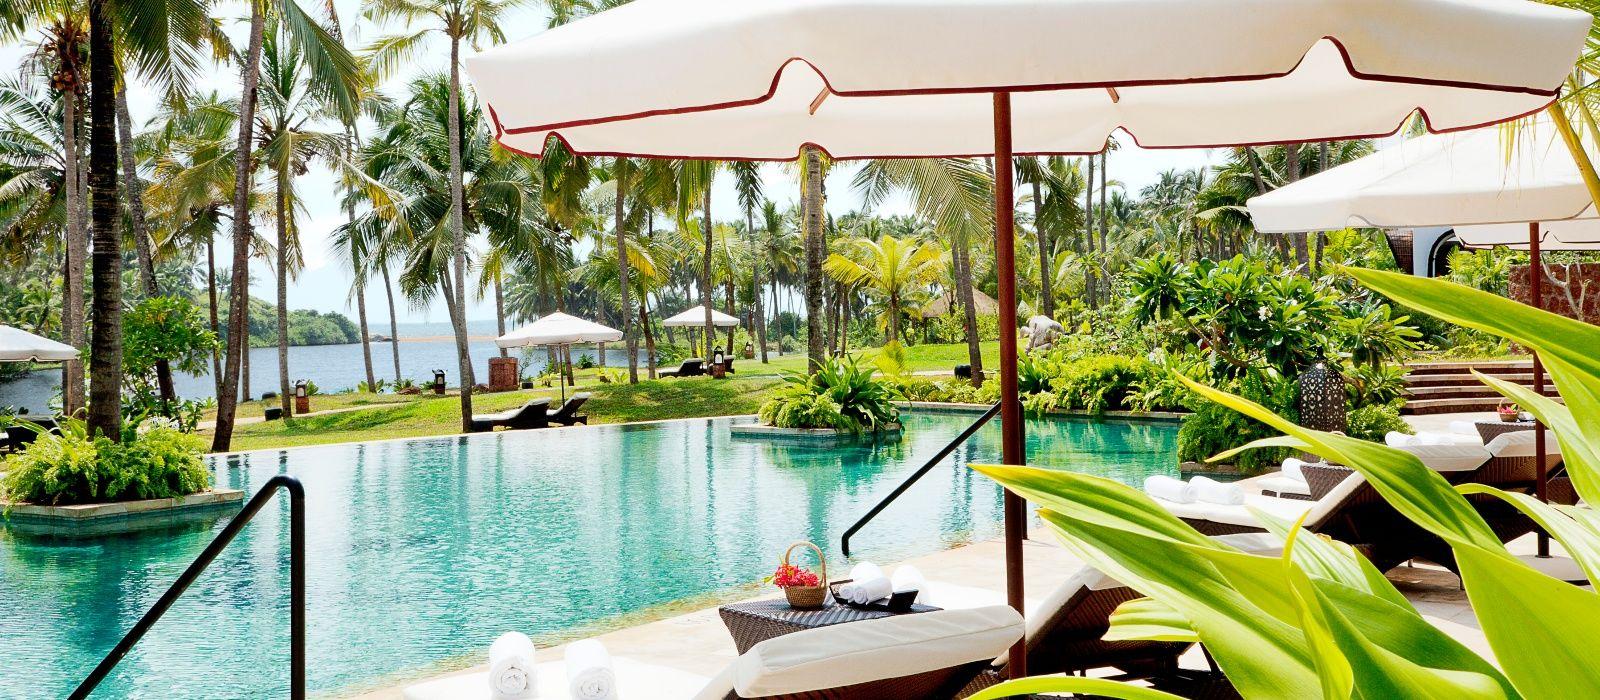 Kerala: Eden of the Tropics Tour Trip 3